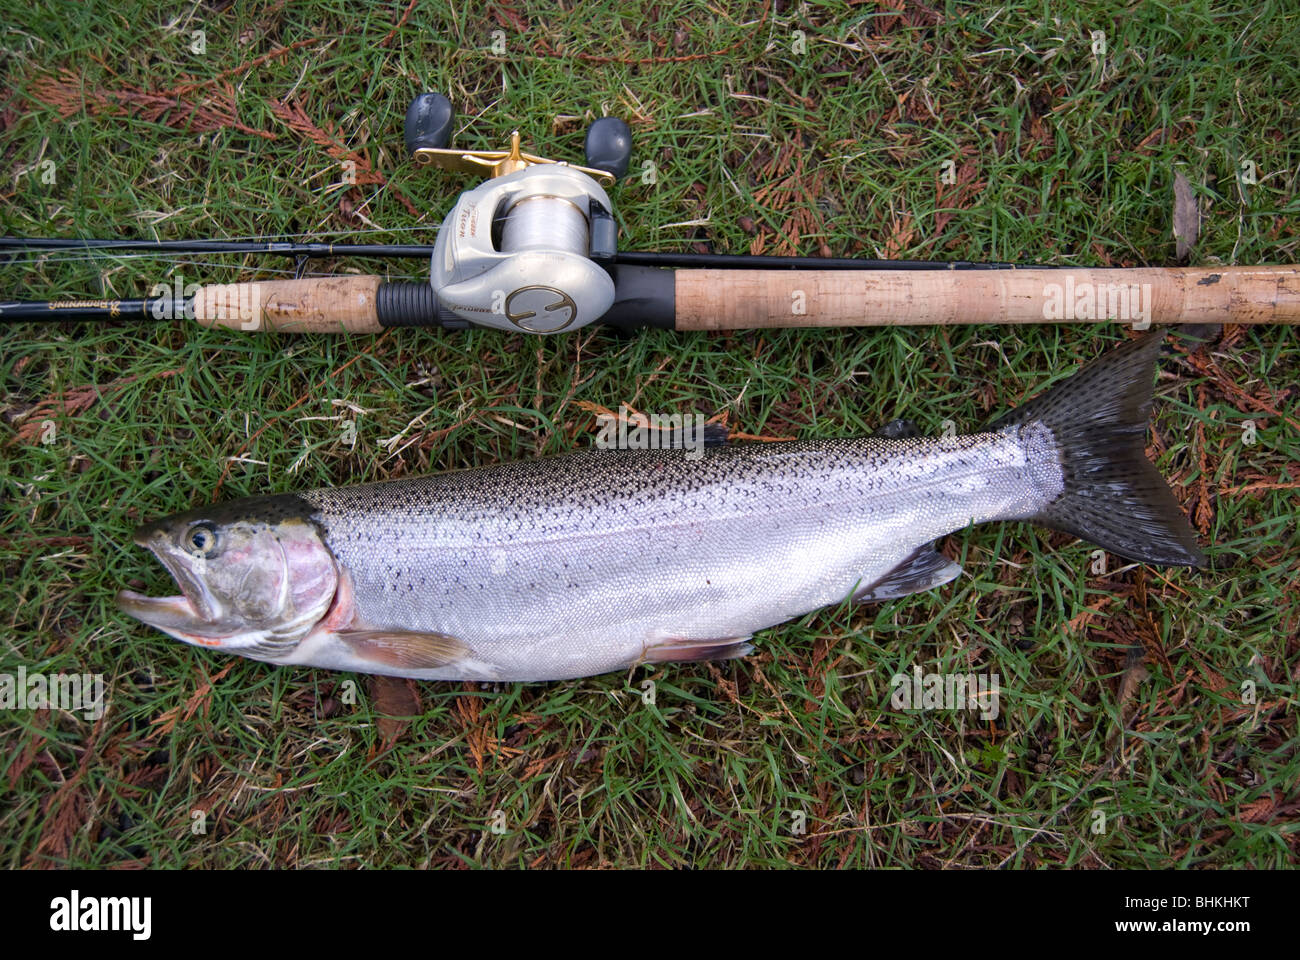 Cutthroat trout fishing lake sammamish washington near for Trout fishing in washington